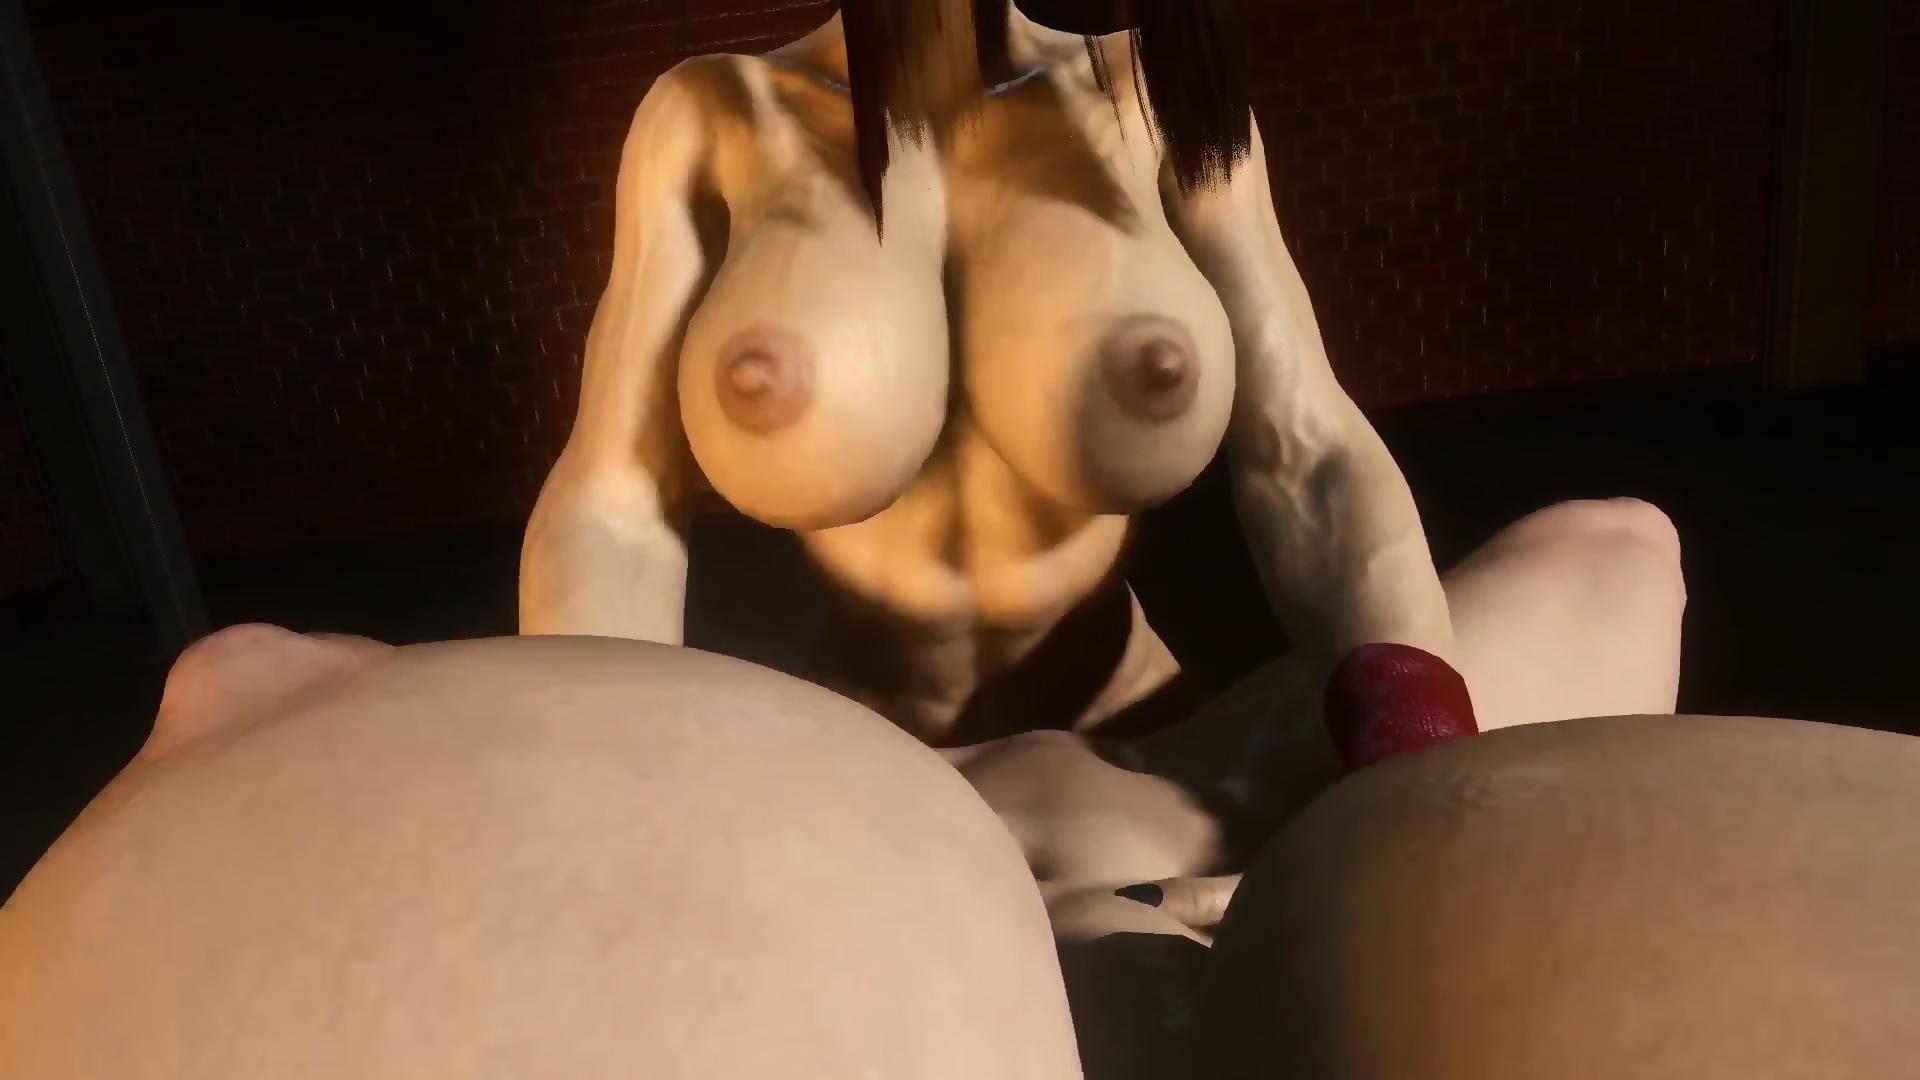 Big Tits Girlfriend Home Made